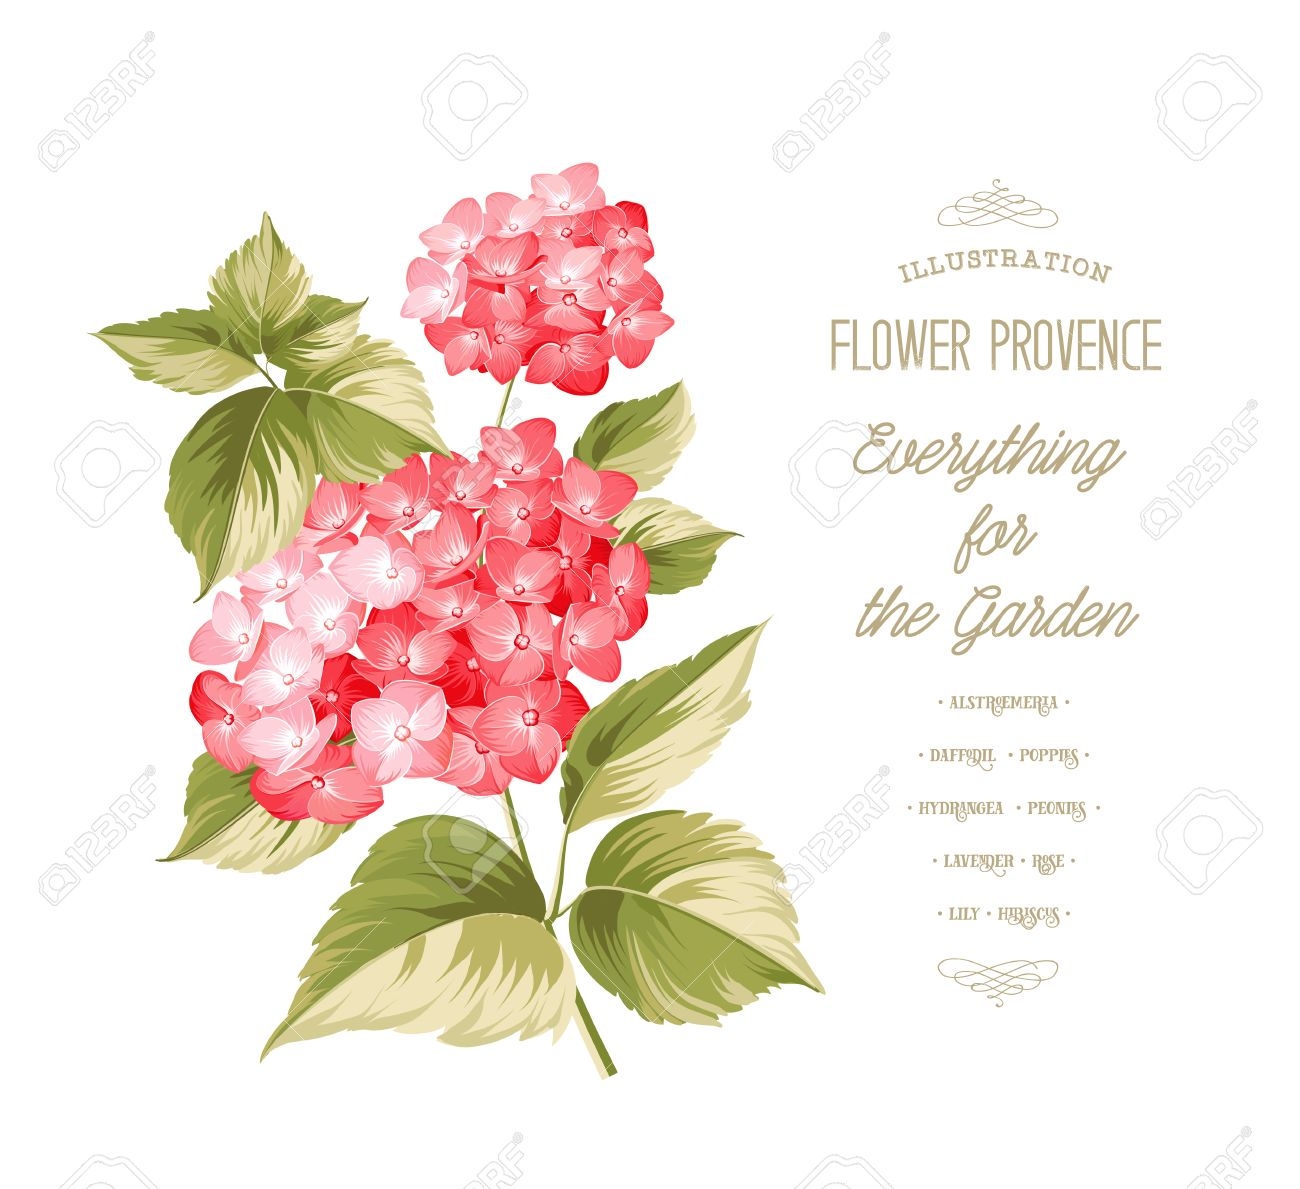 Uas Flores Top Affordable Fabulous Interesting Cool Decoracin De